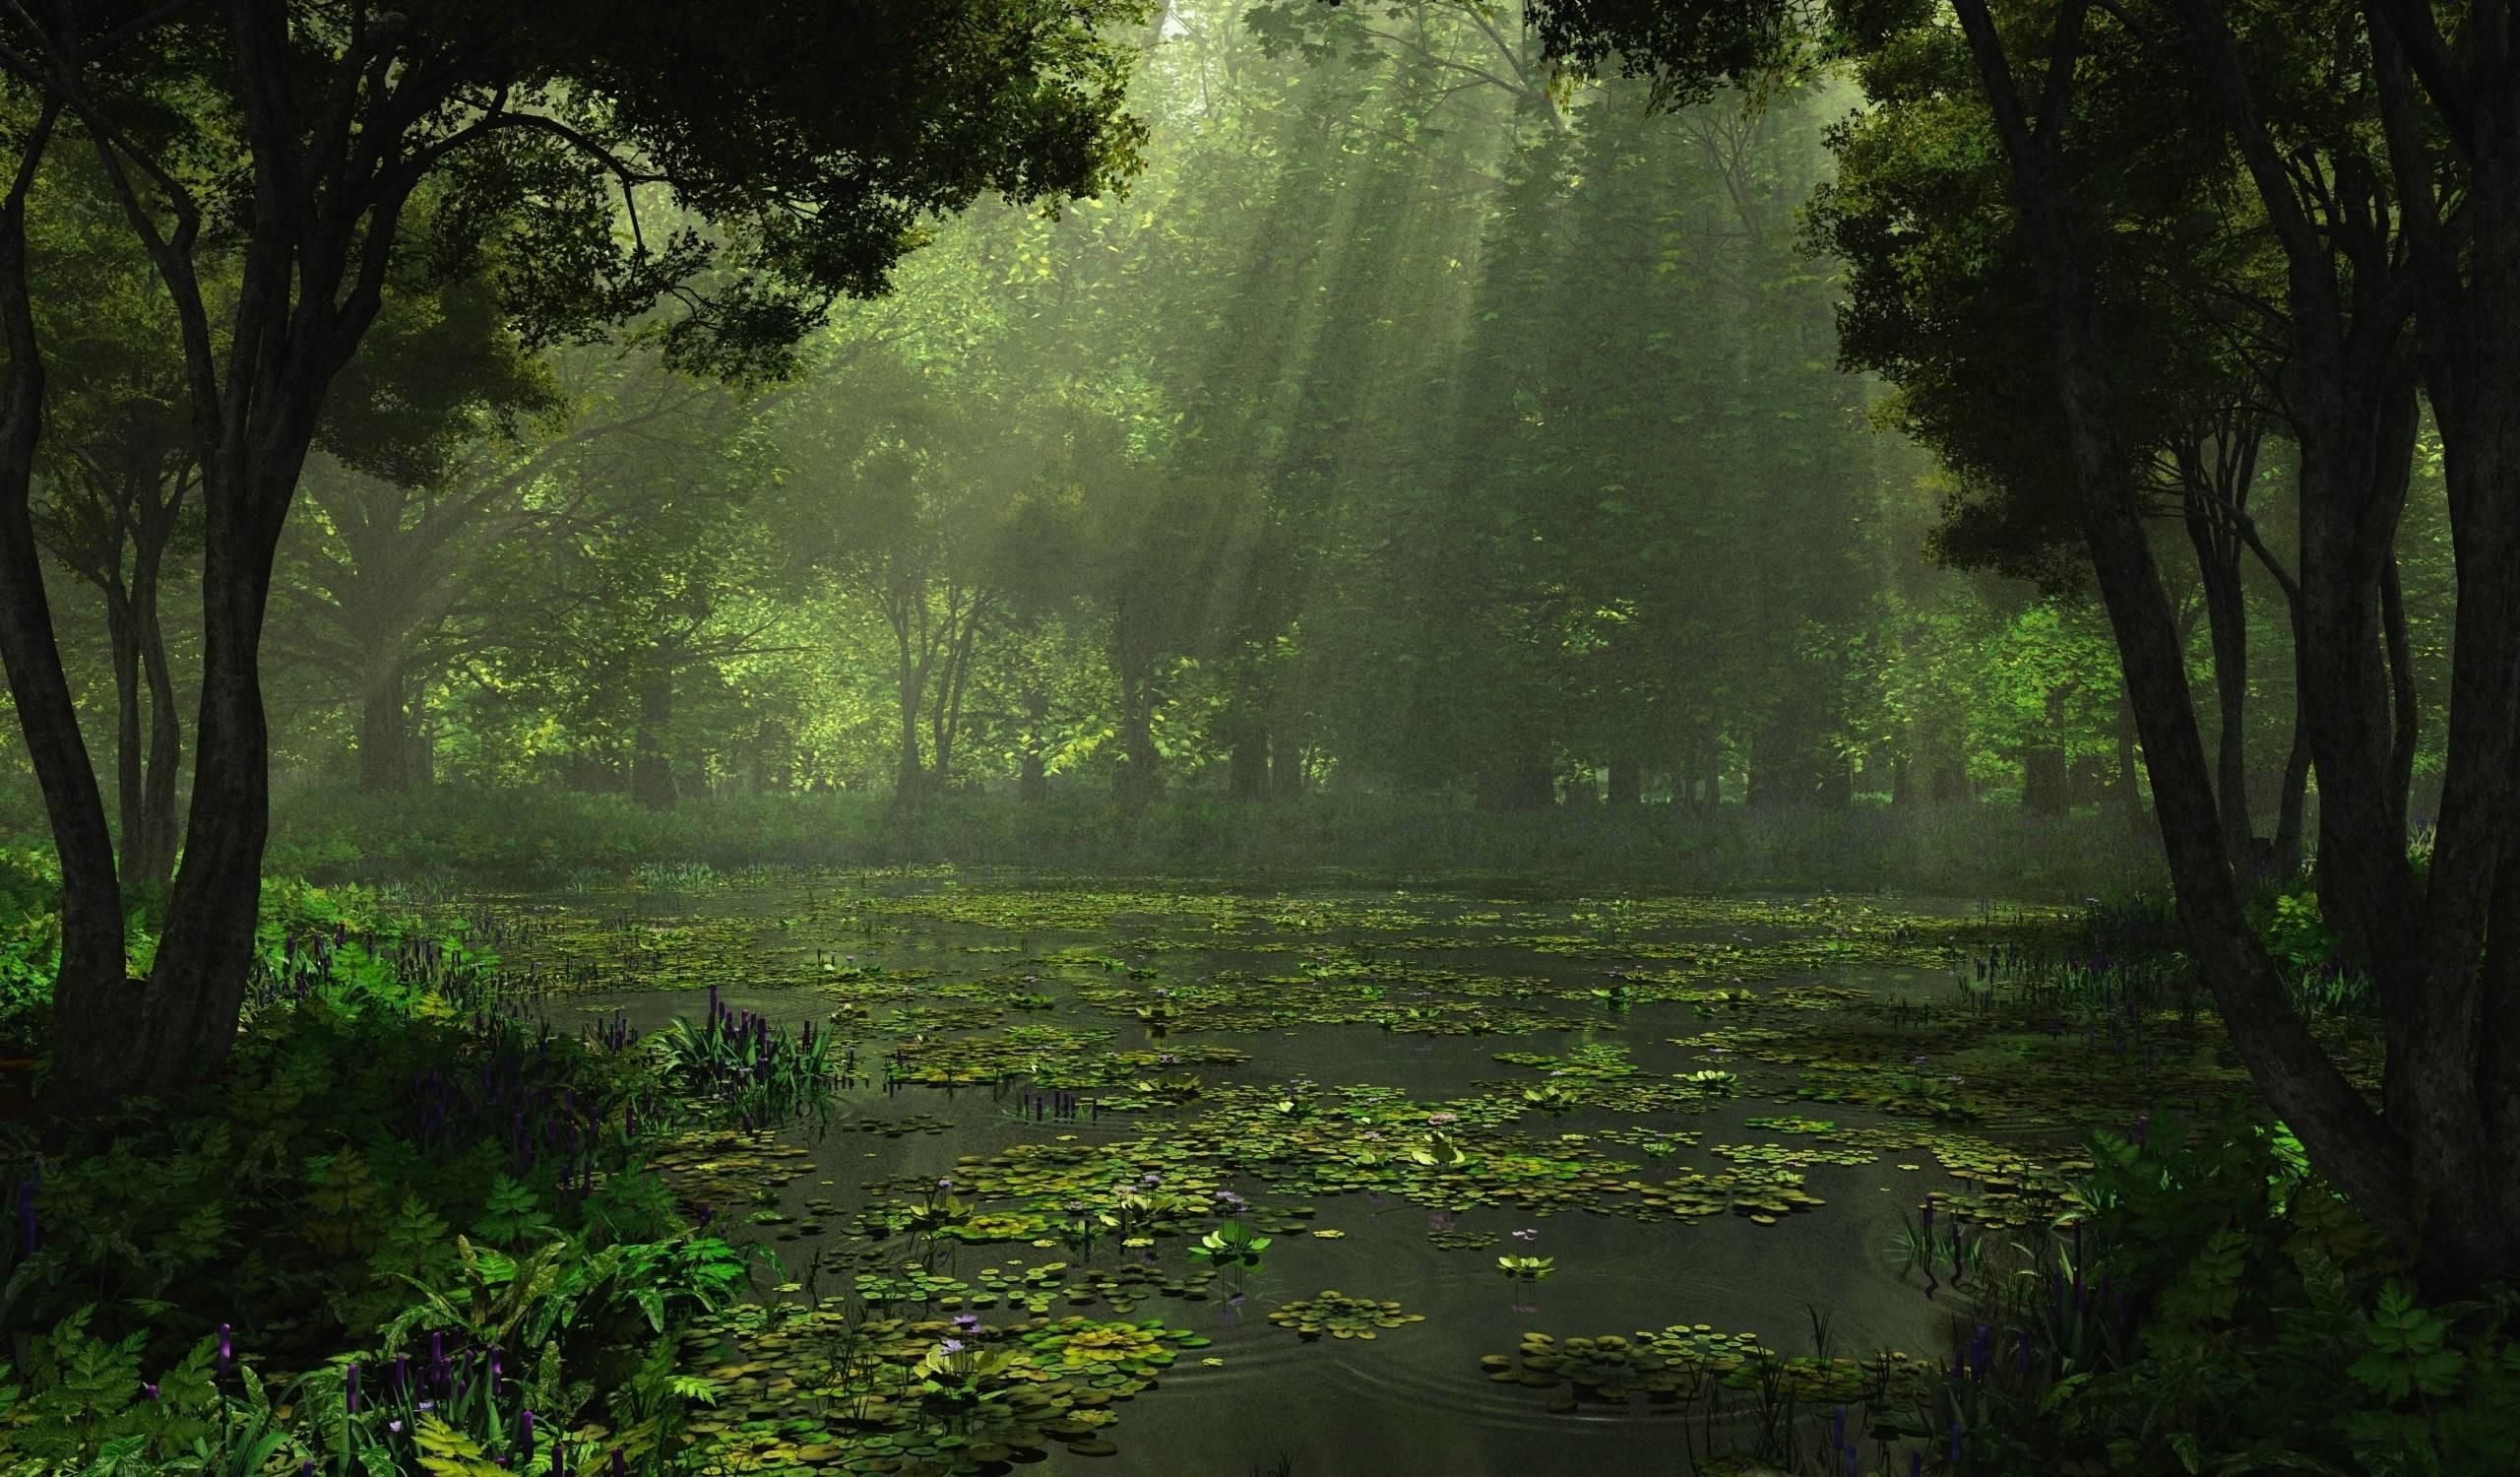 Rain Nature Desktop · Nature Wallpapers HD | EZIBOX · HD Wallpapers